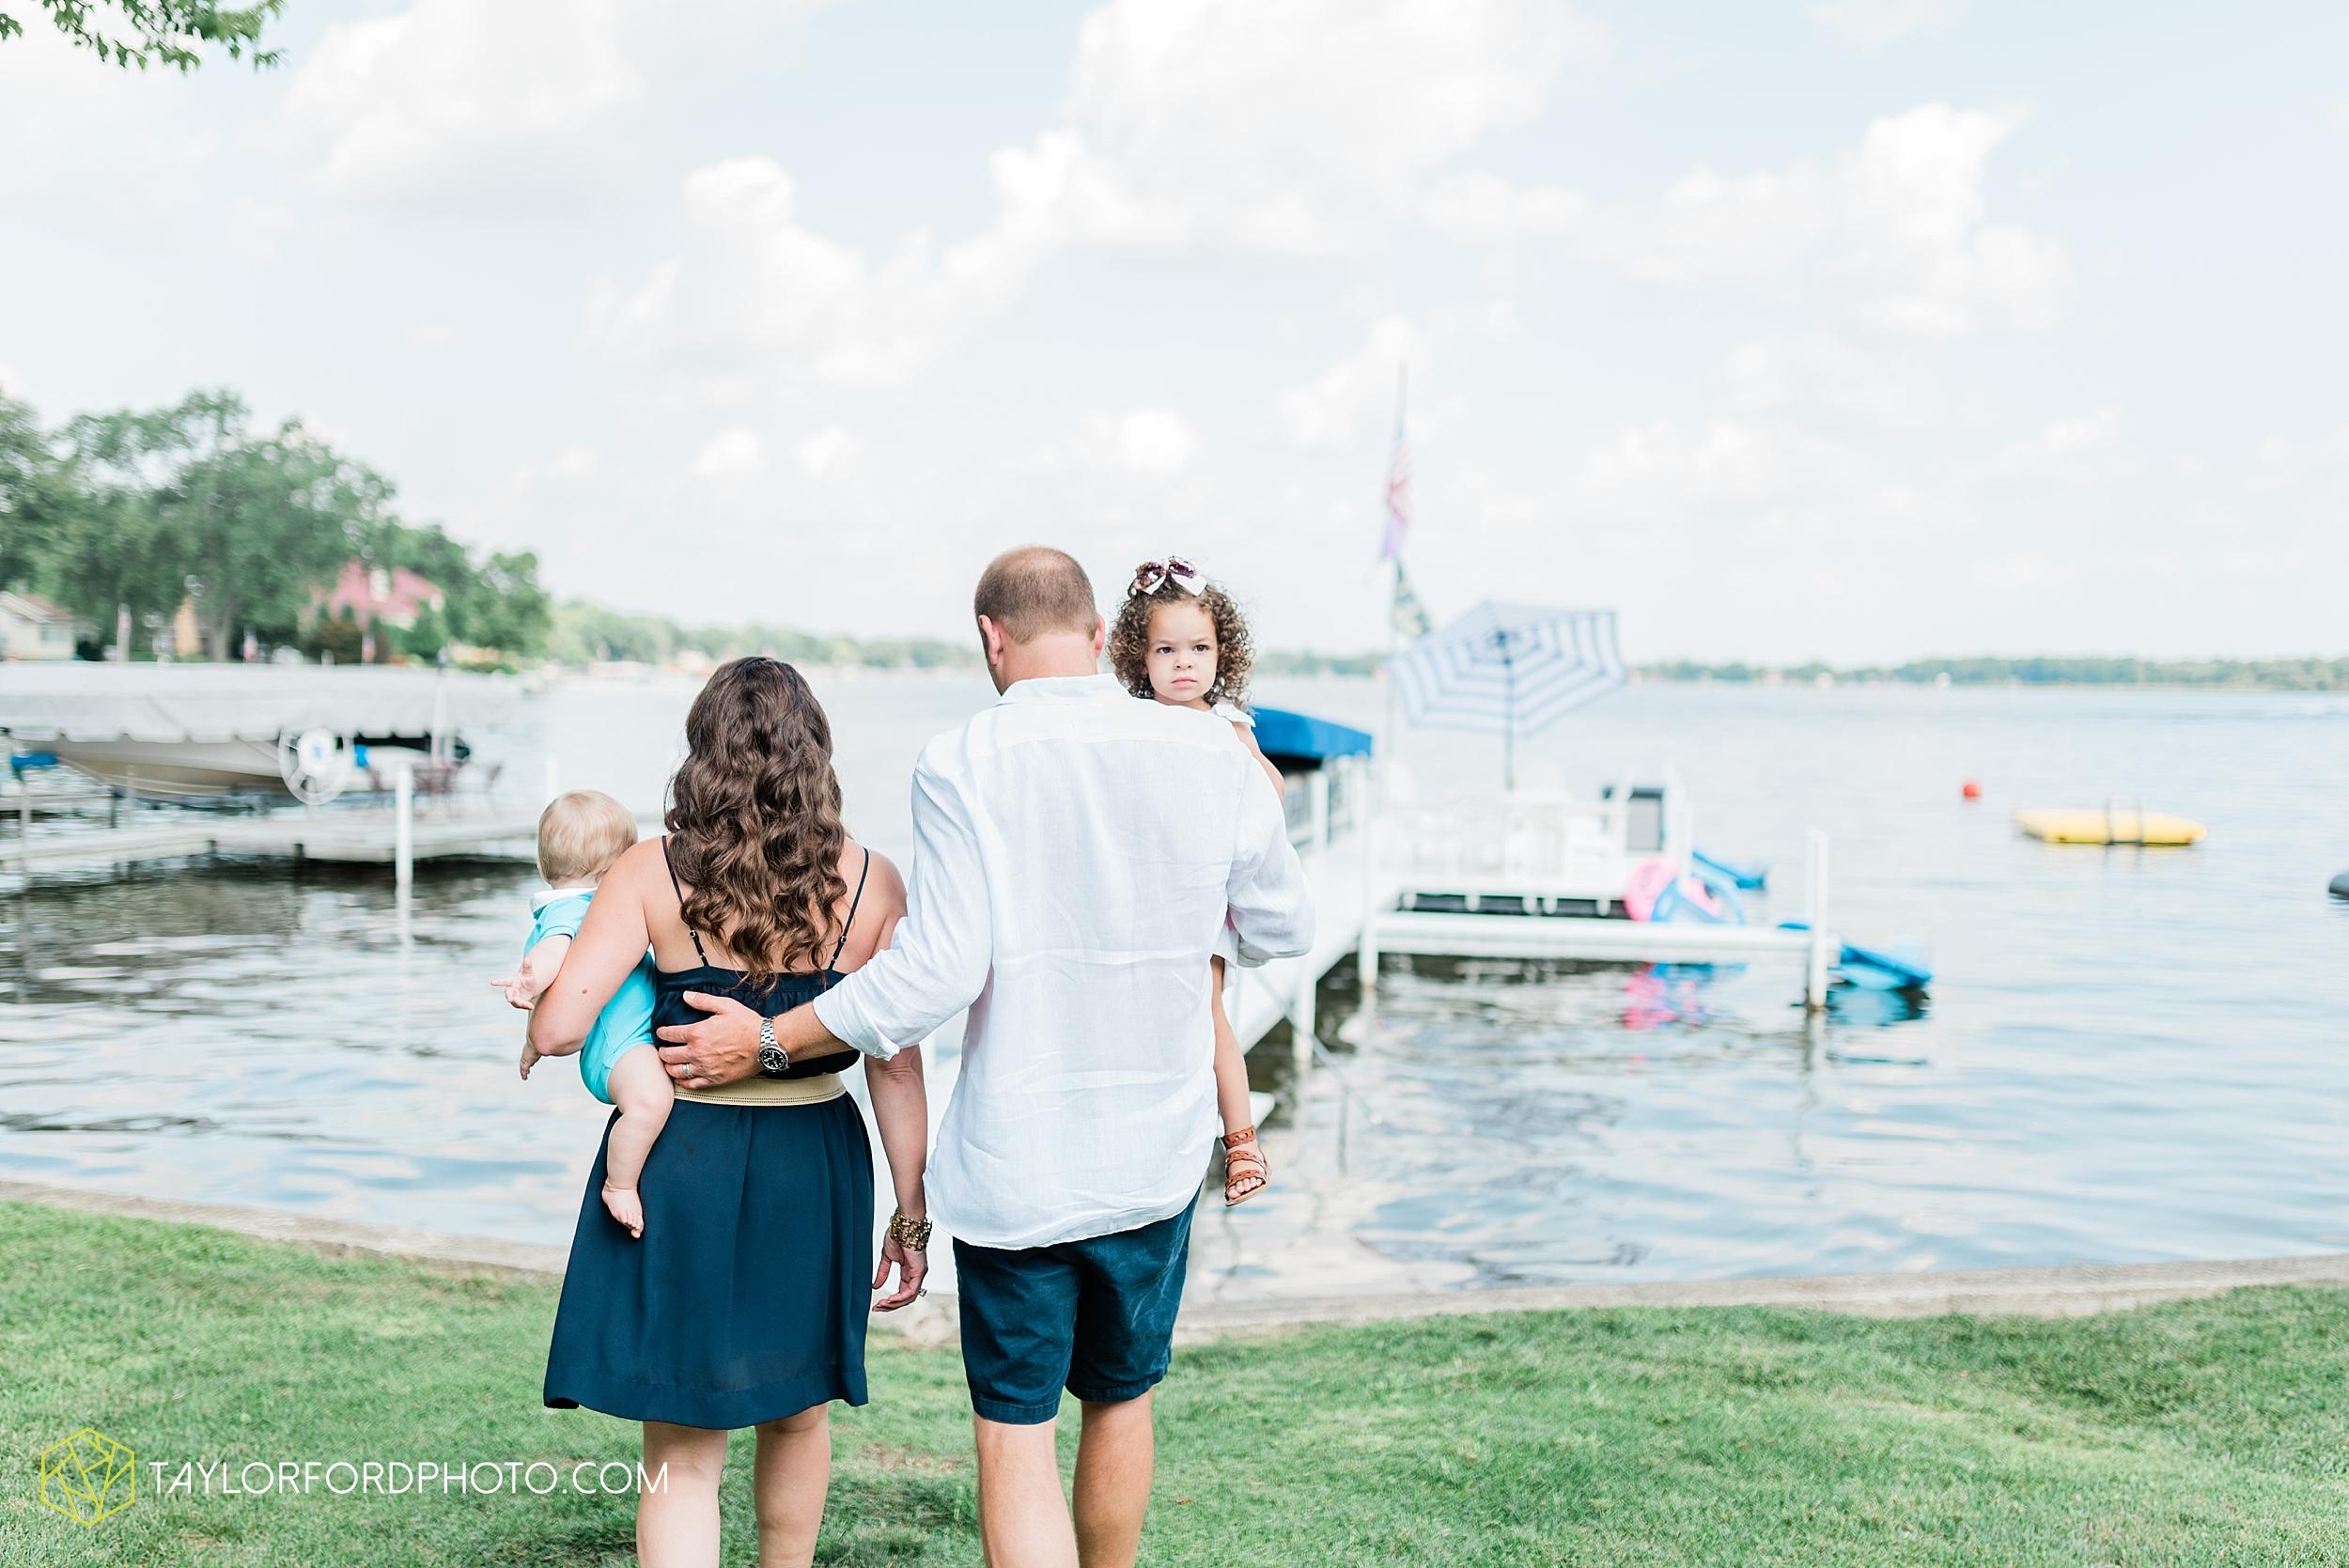 syracuse-indiana-lake-wawasee-family-lake-house-lakeside-park-lifestyle-photographer-taylor-ford-photographer_9424.jpg